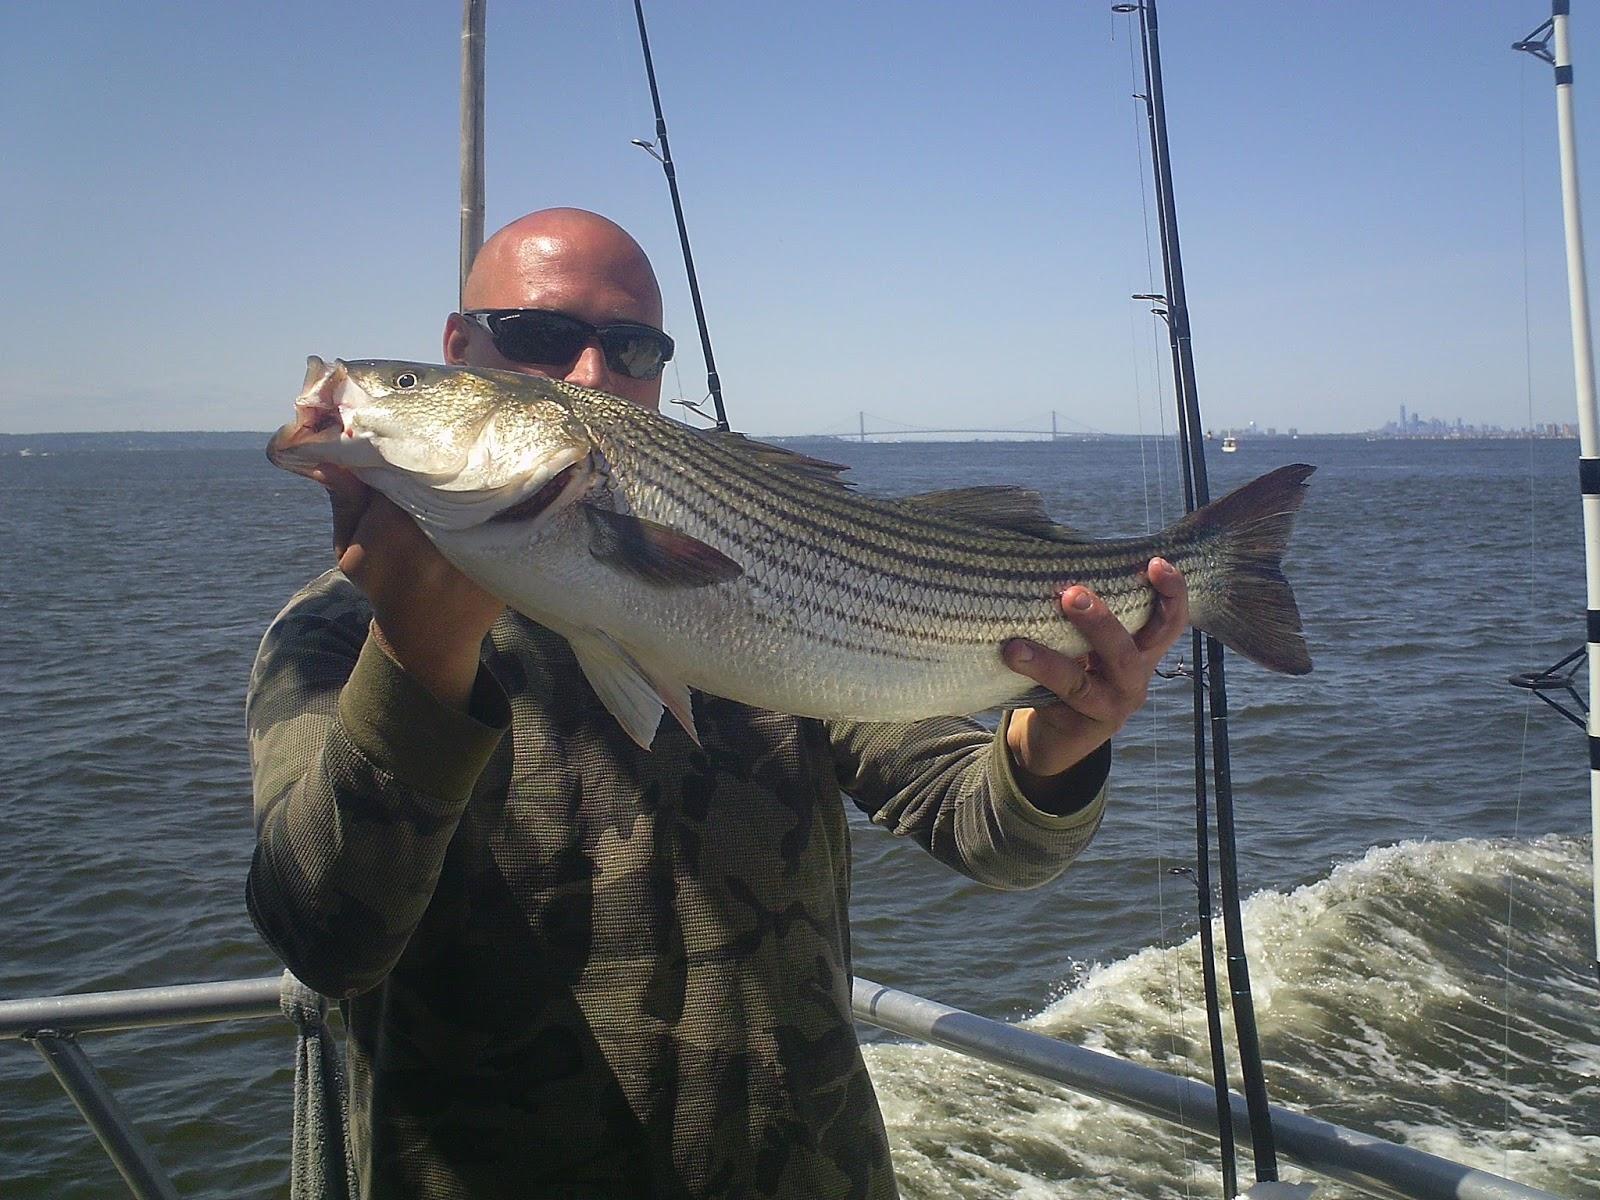 Nj salt fish 2017 05 22 seahunter atlantic highlands for Atlantic highlands fishing report